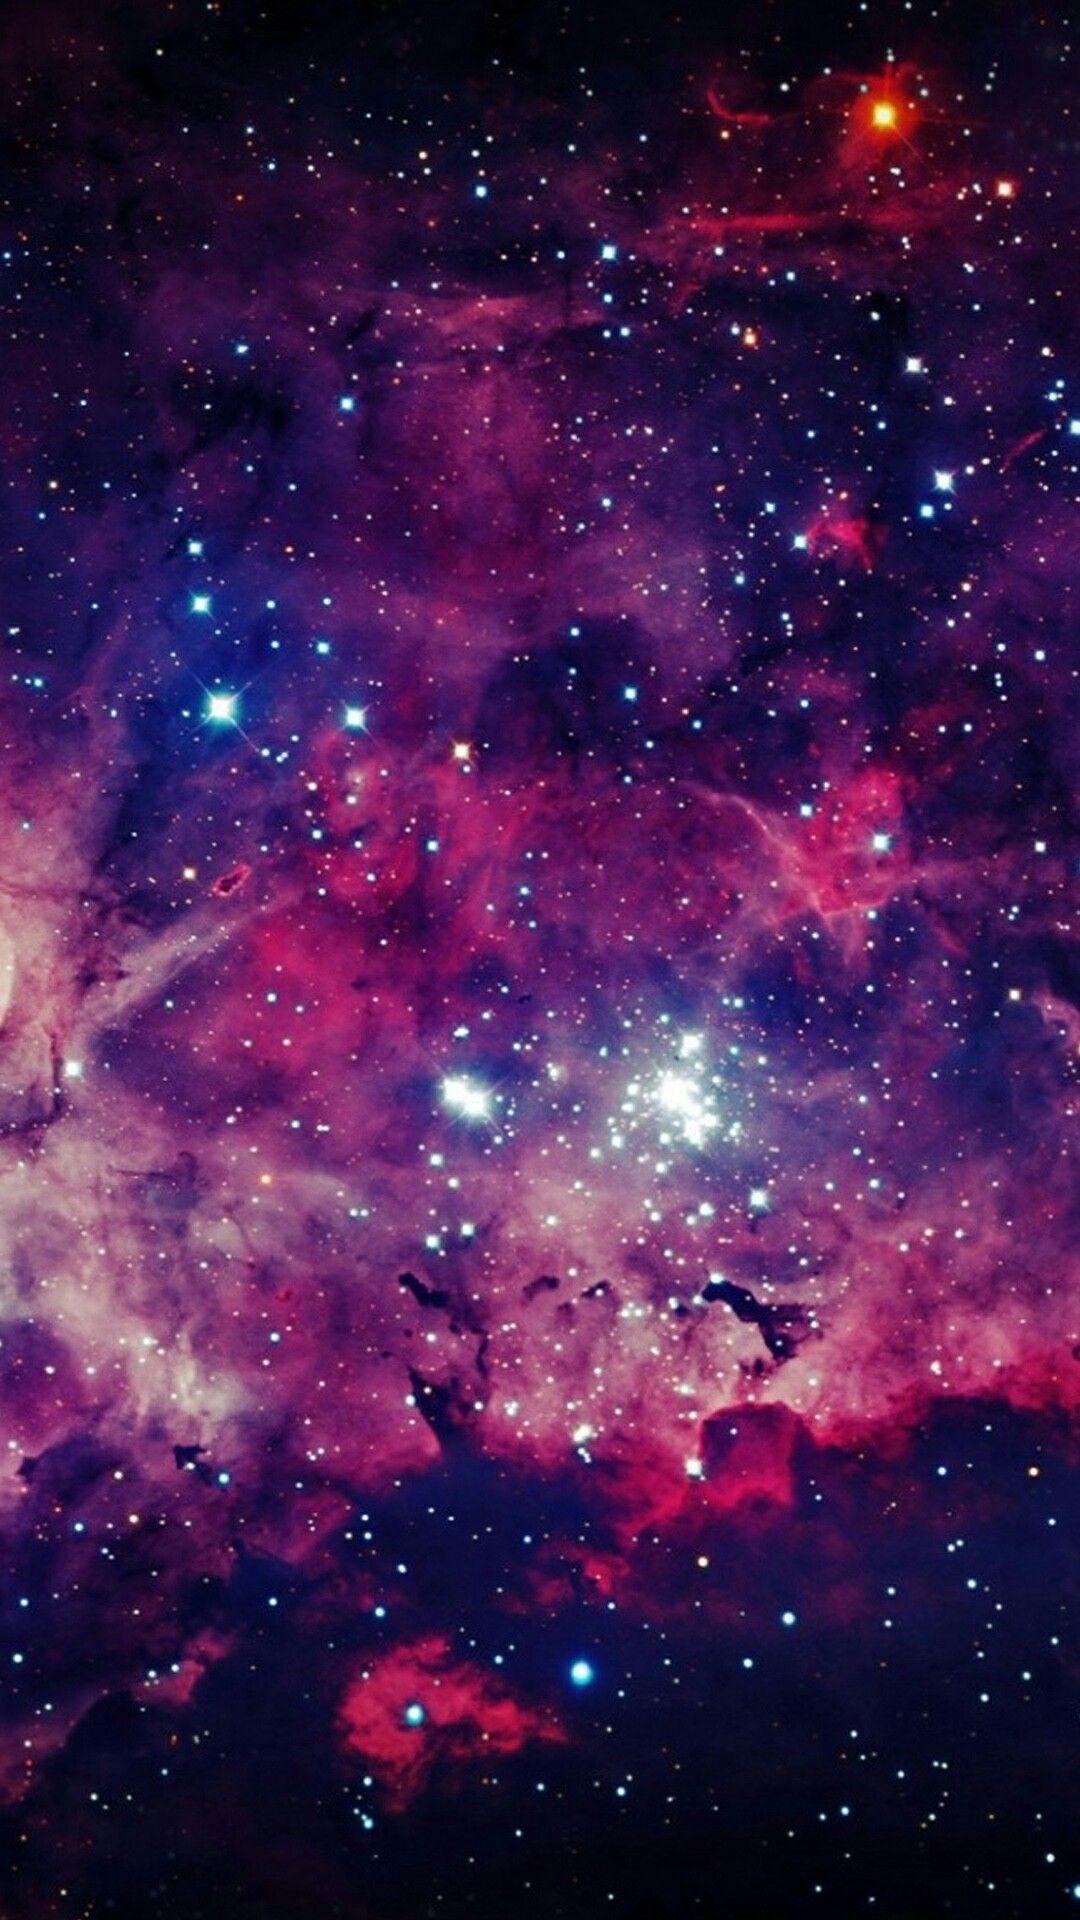 Pretty Galaxy Space Phone Wallpaper Galaxy Wallpaper Wallpaper Space